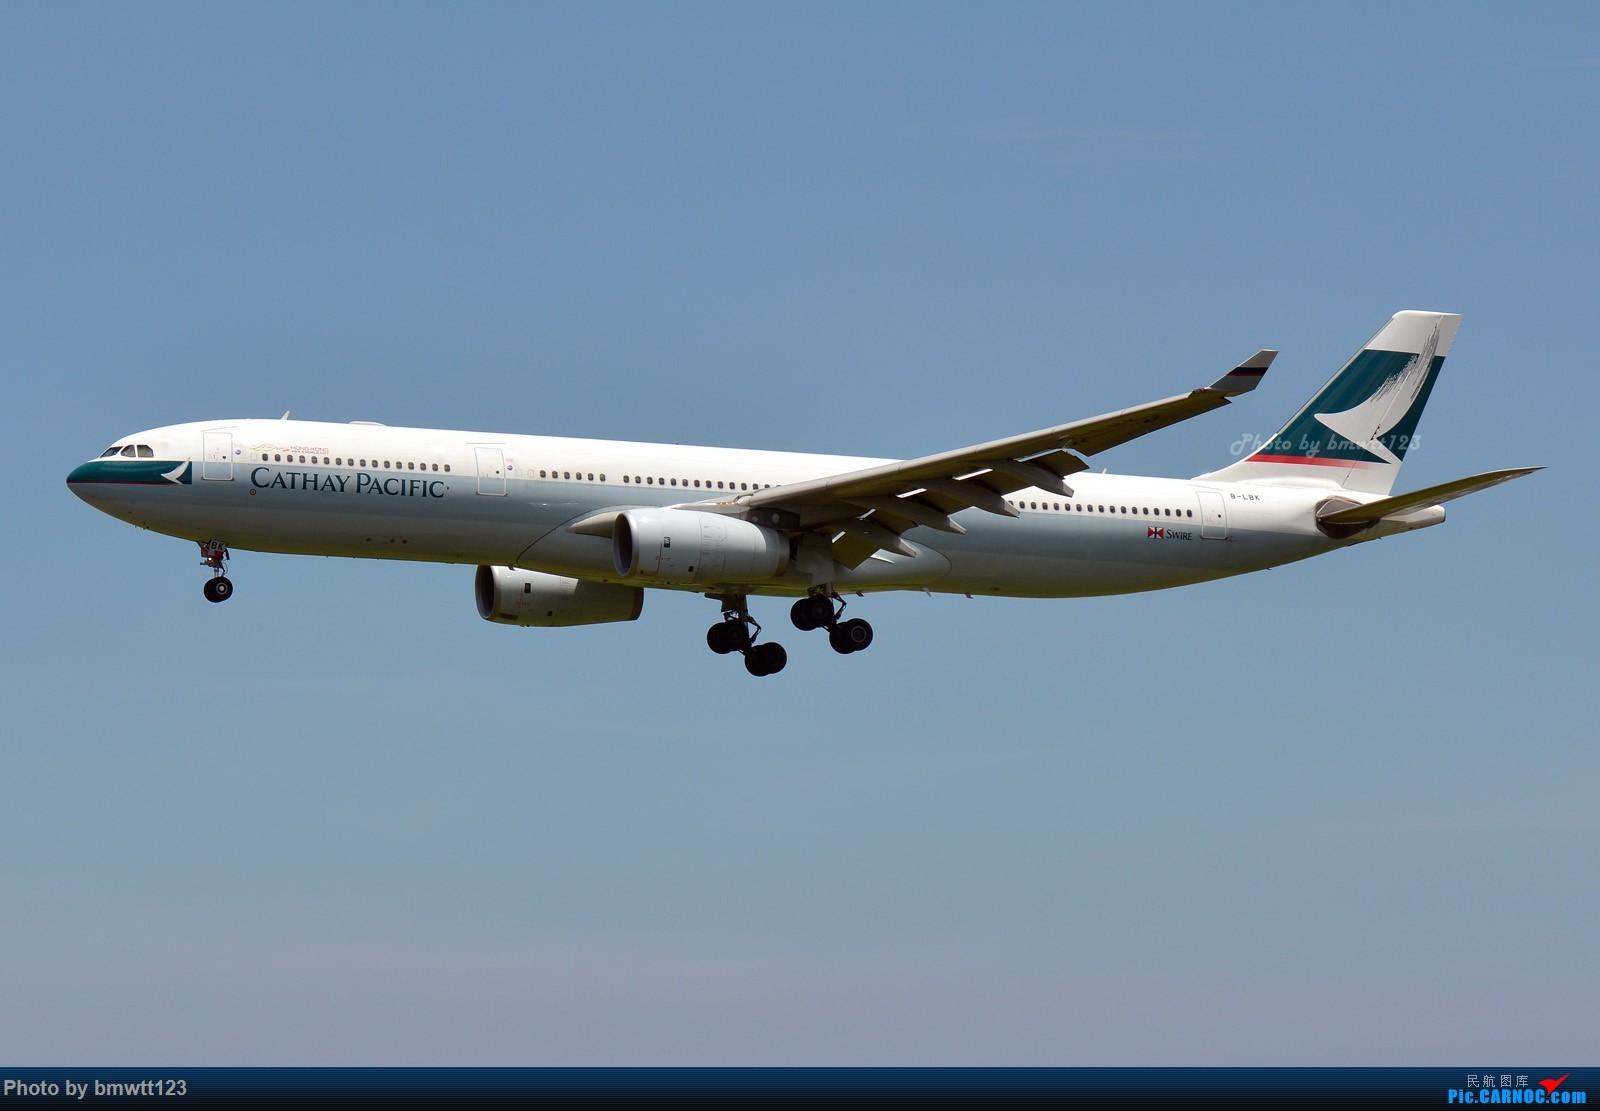 Re:[原创]【TPE桃园】记录7.3复飞:长荣77W滑入23L后济州738彩绘机复飞 AIRBUS A330-300 B-LBK 中国台北桃园国际机场